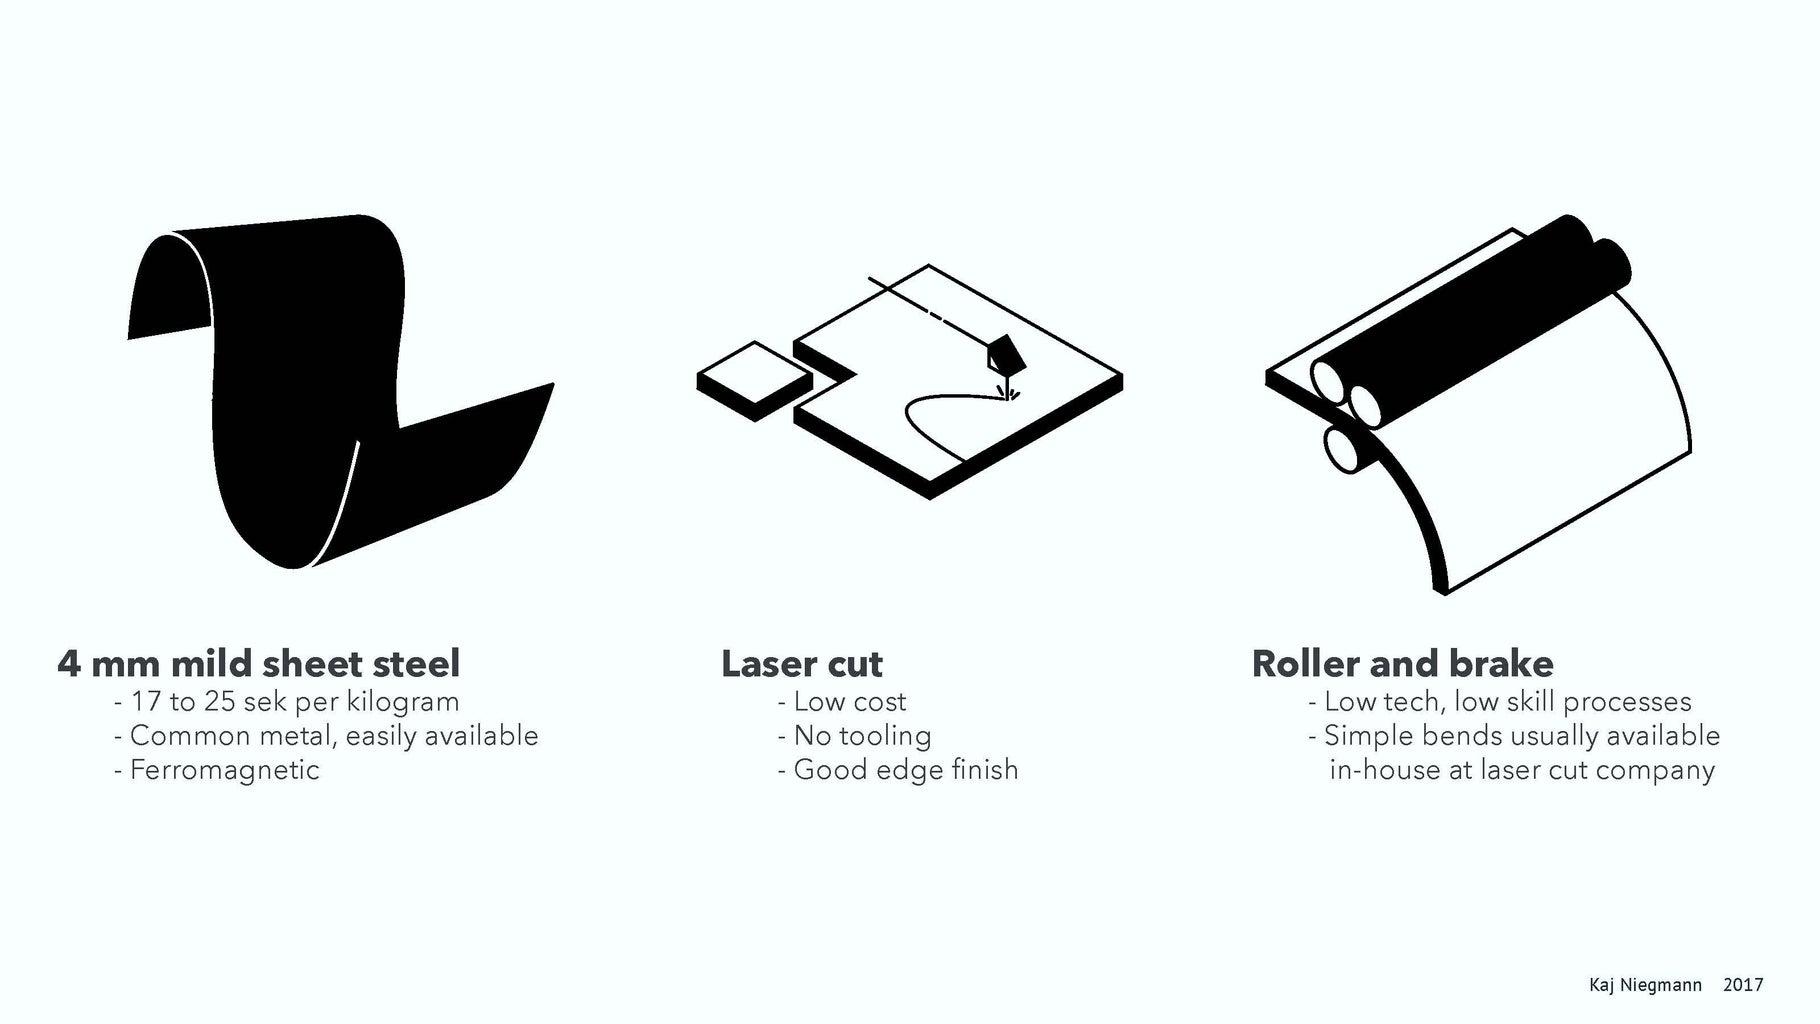 Flatland Furniture - How to Cut, Bend, and Glue Metal